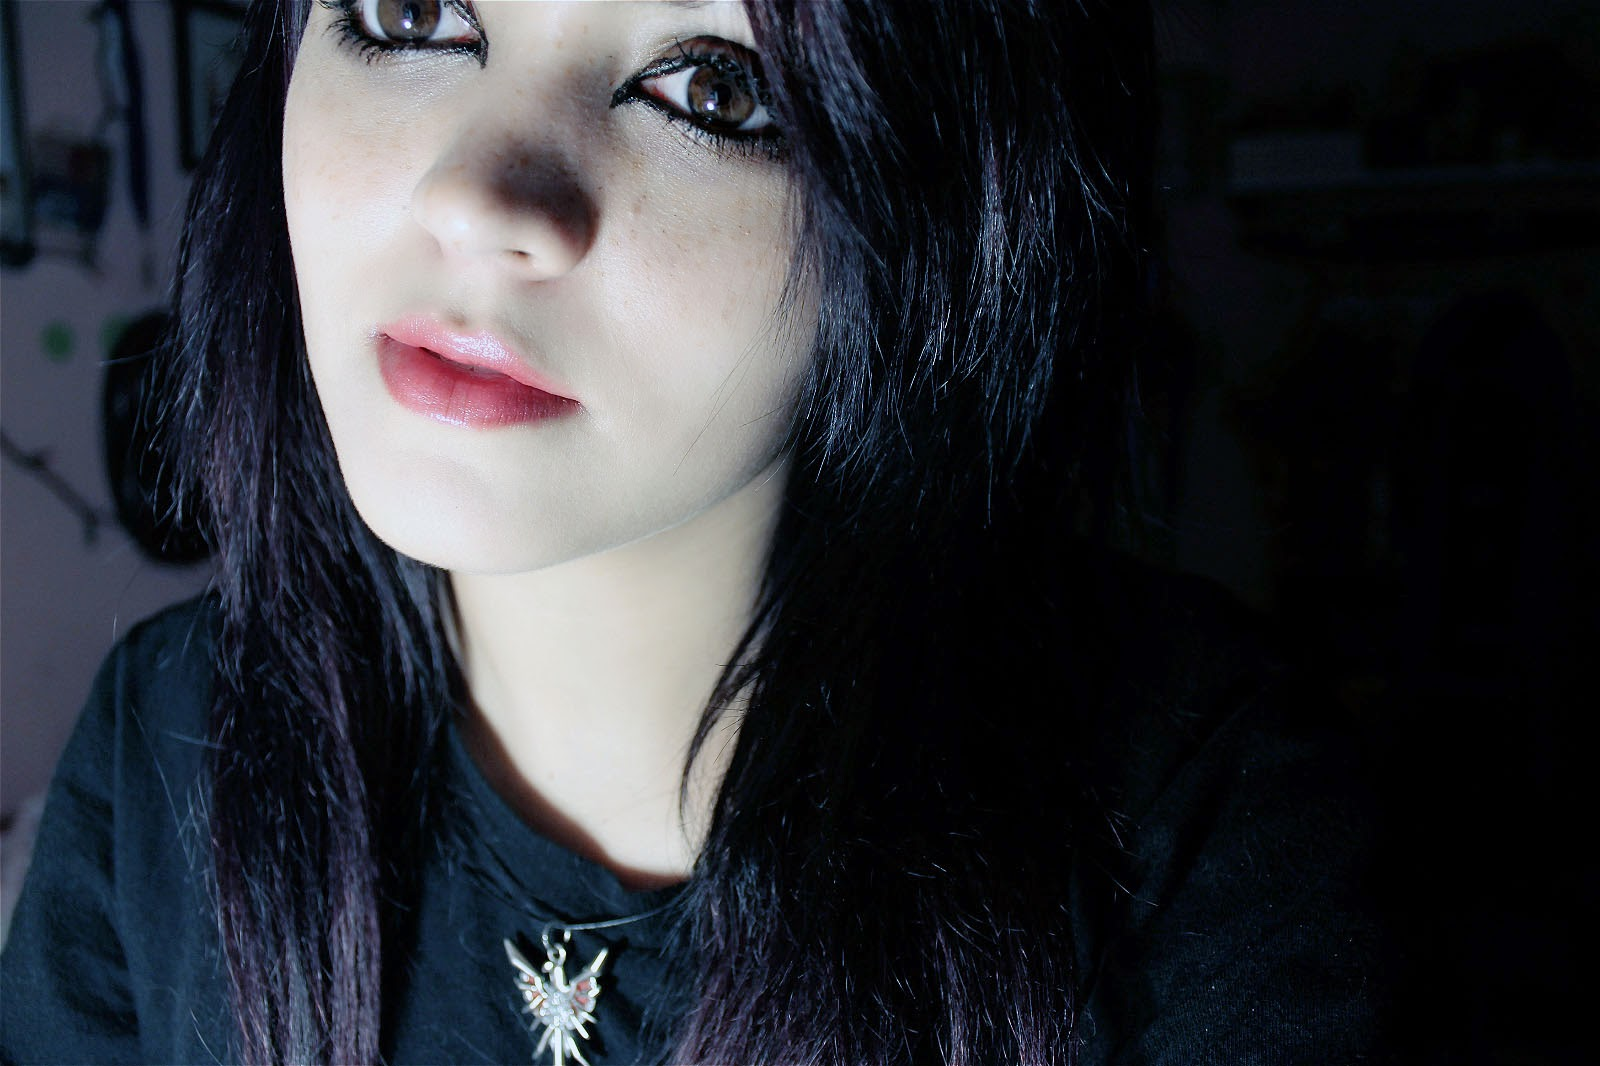 ... dark hair with blue tips dark brown hair with blue tint dark hair with